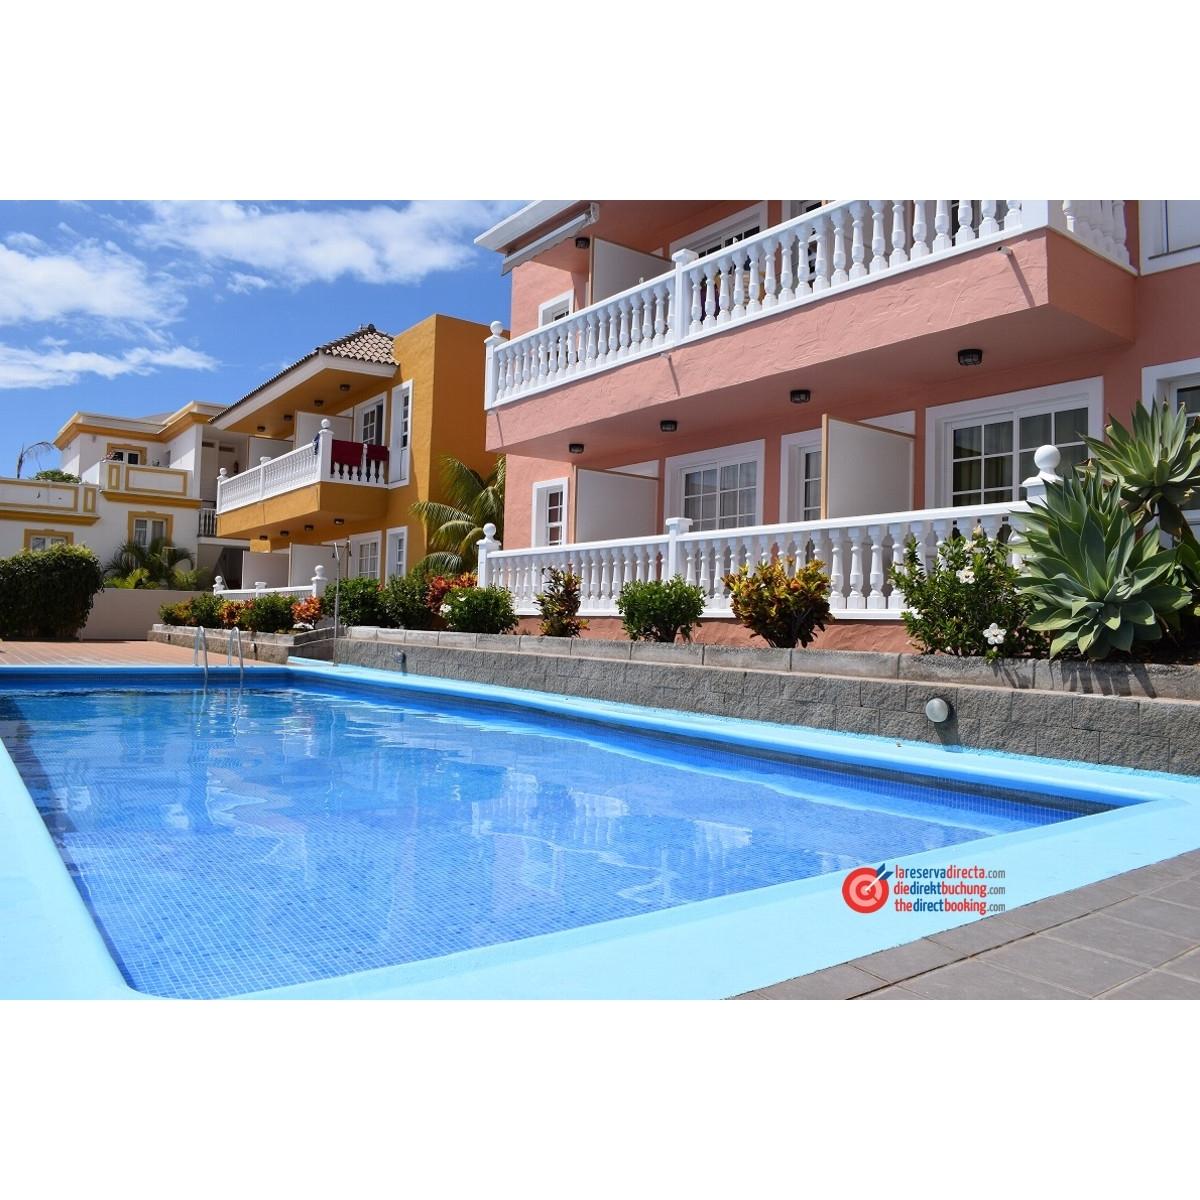 Apartments Roque (Puerto Naos) - Max. 4 persons - O.A.